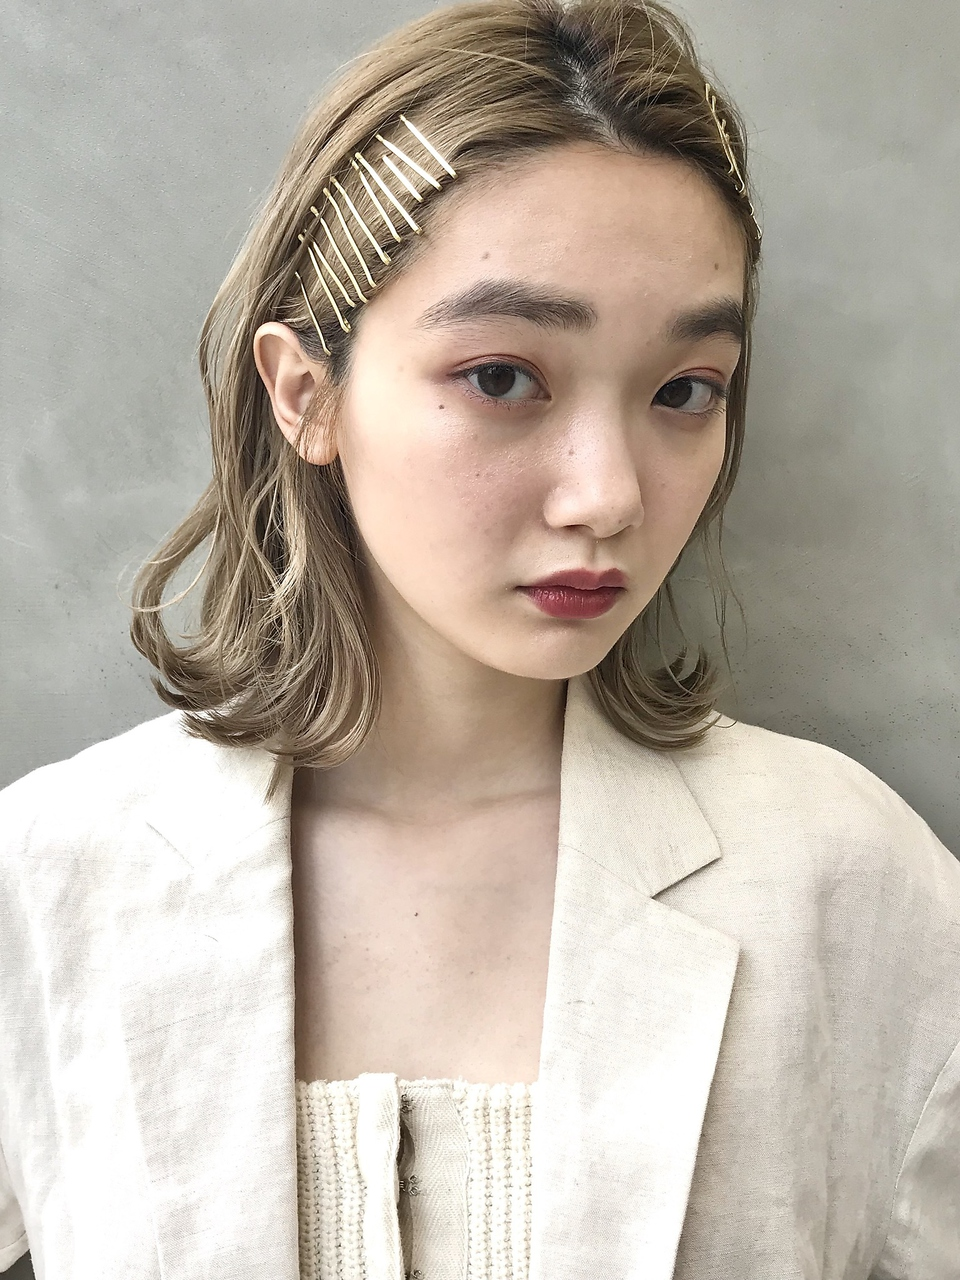 【SUN】ザクザクゴールドピンアレンジ 蜂谷咲季